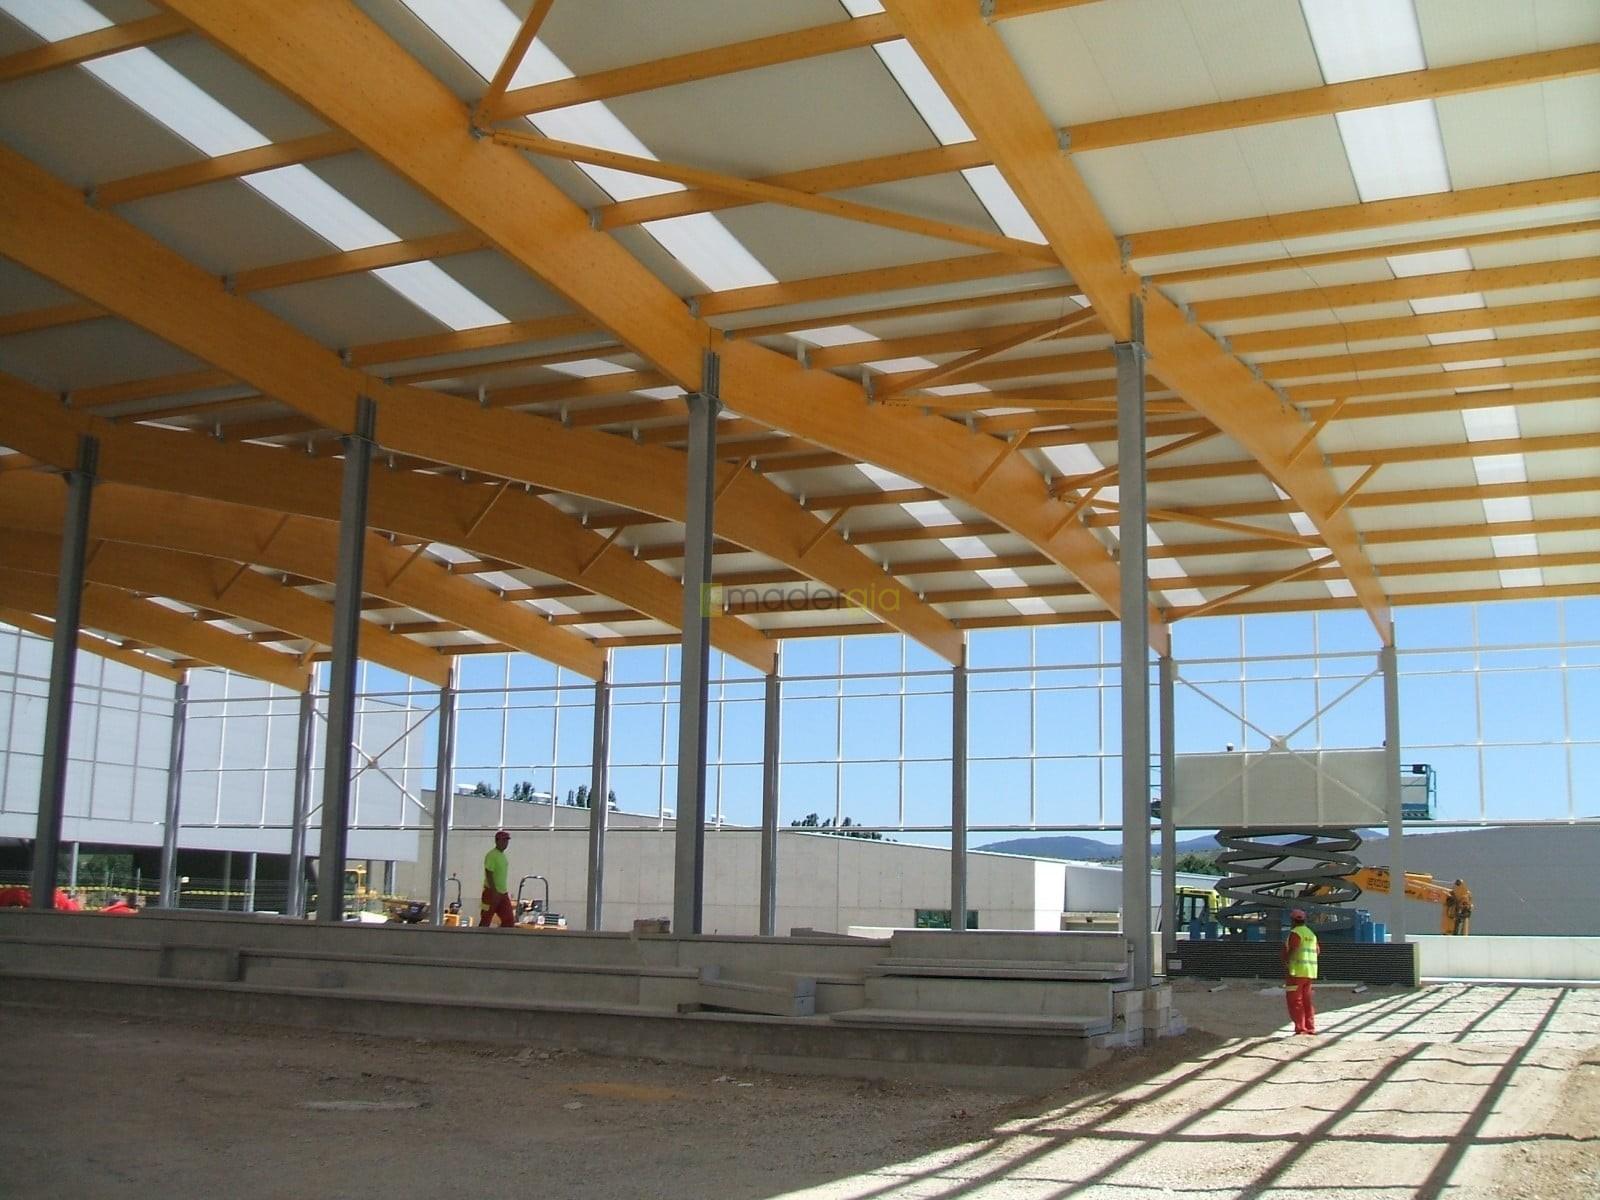 Cubierta de polideportivo madergia - Estructura madera laminada ...